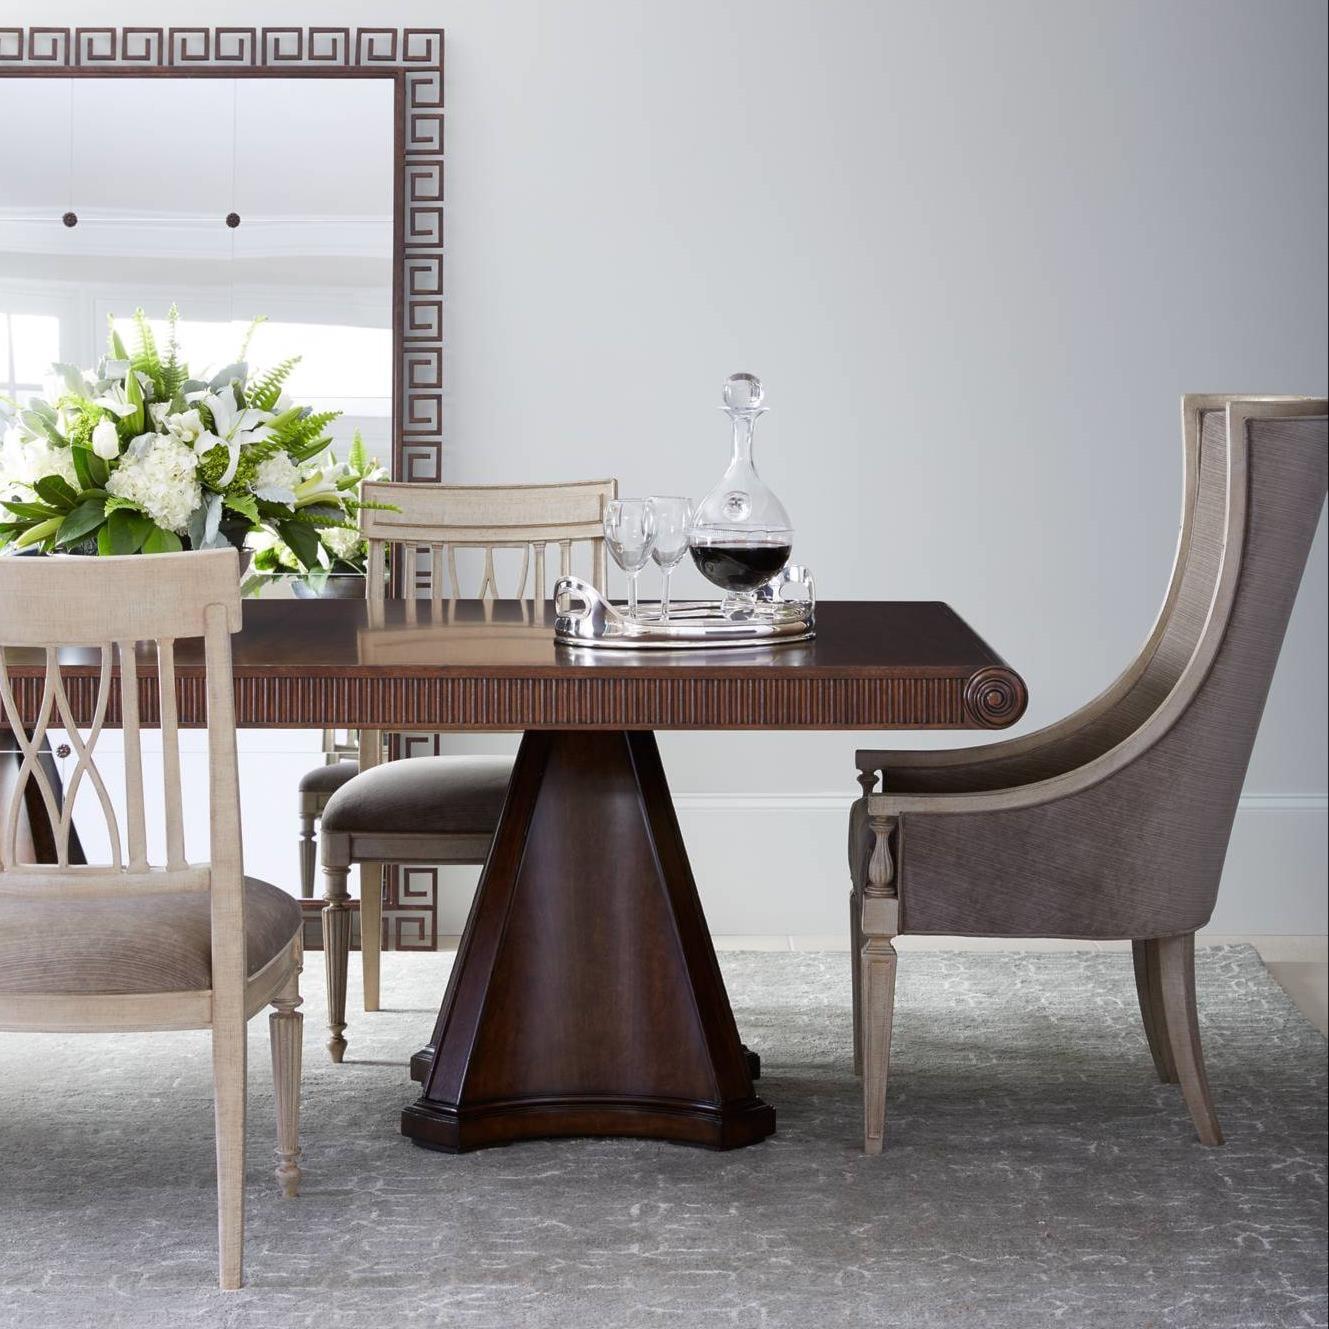 Stanley Furniture Villa Couture 7-Piece Dante Double Pedestal